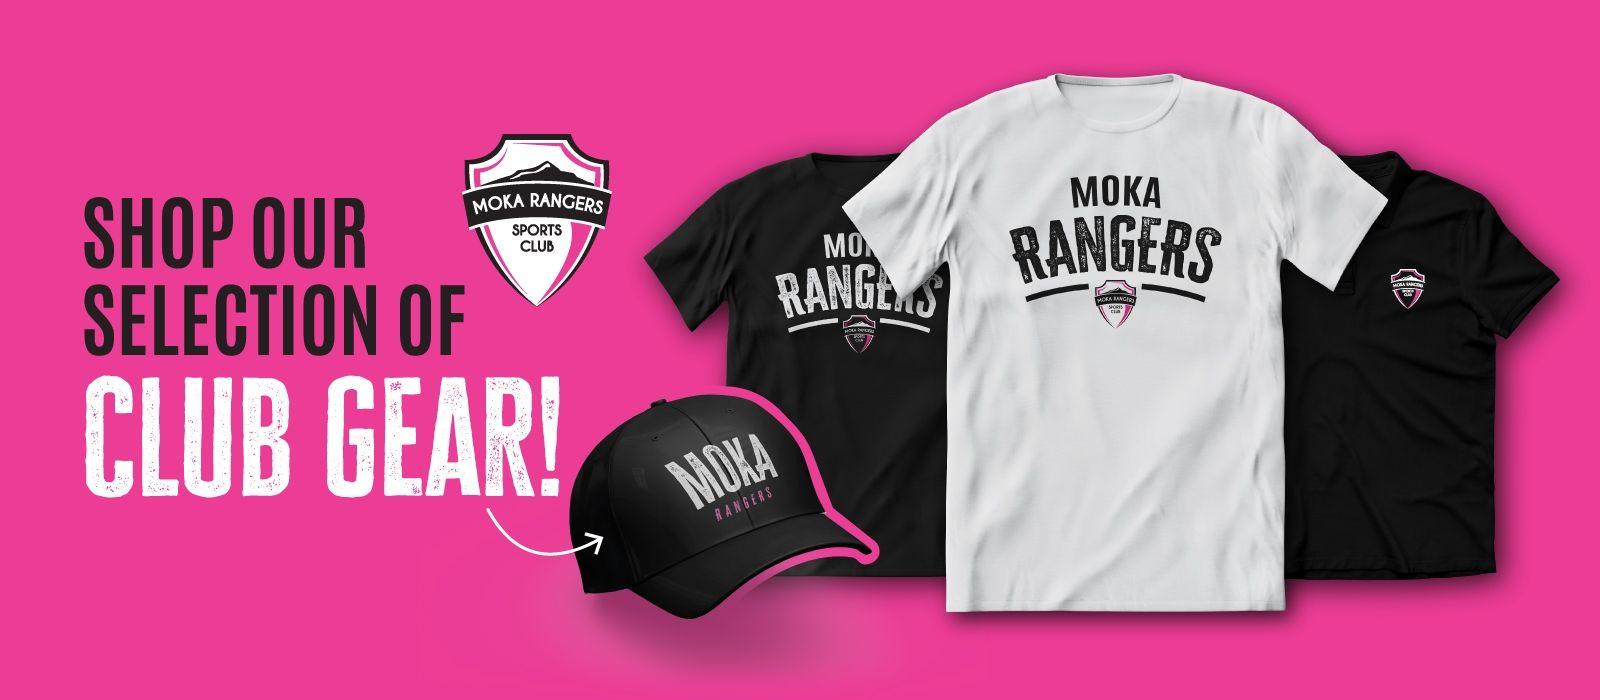 Moka Trail Rangers collection